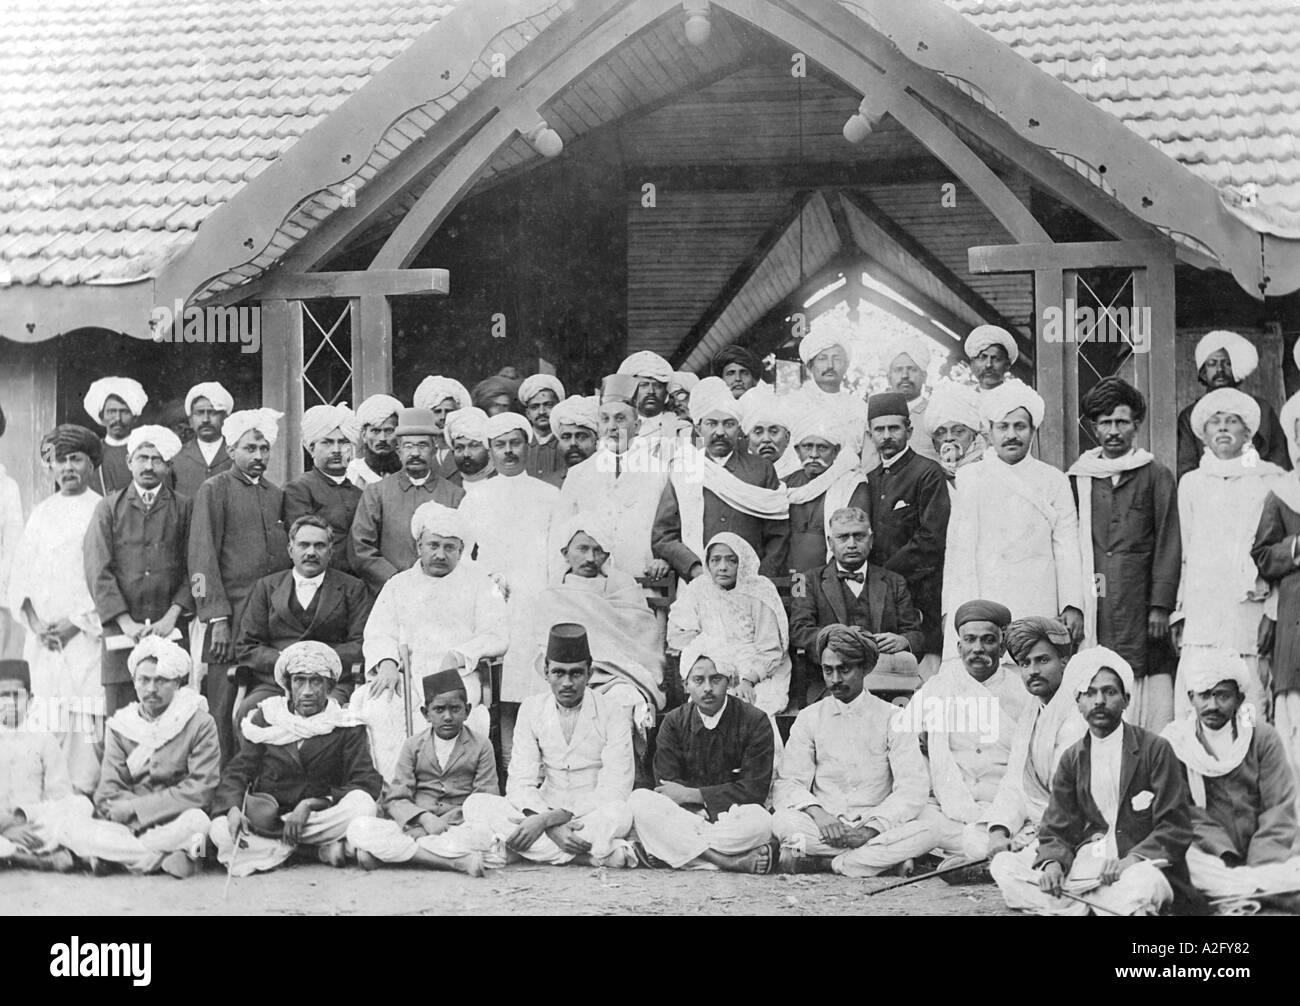 La ricezione a Jetpur Kathiawad Gujrat India al Mahatma Gandhi e sua moglie Kasturba Gandhi 27 Gennaio 1915 Immagini Stock